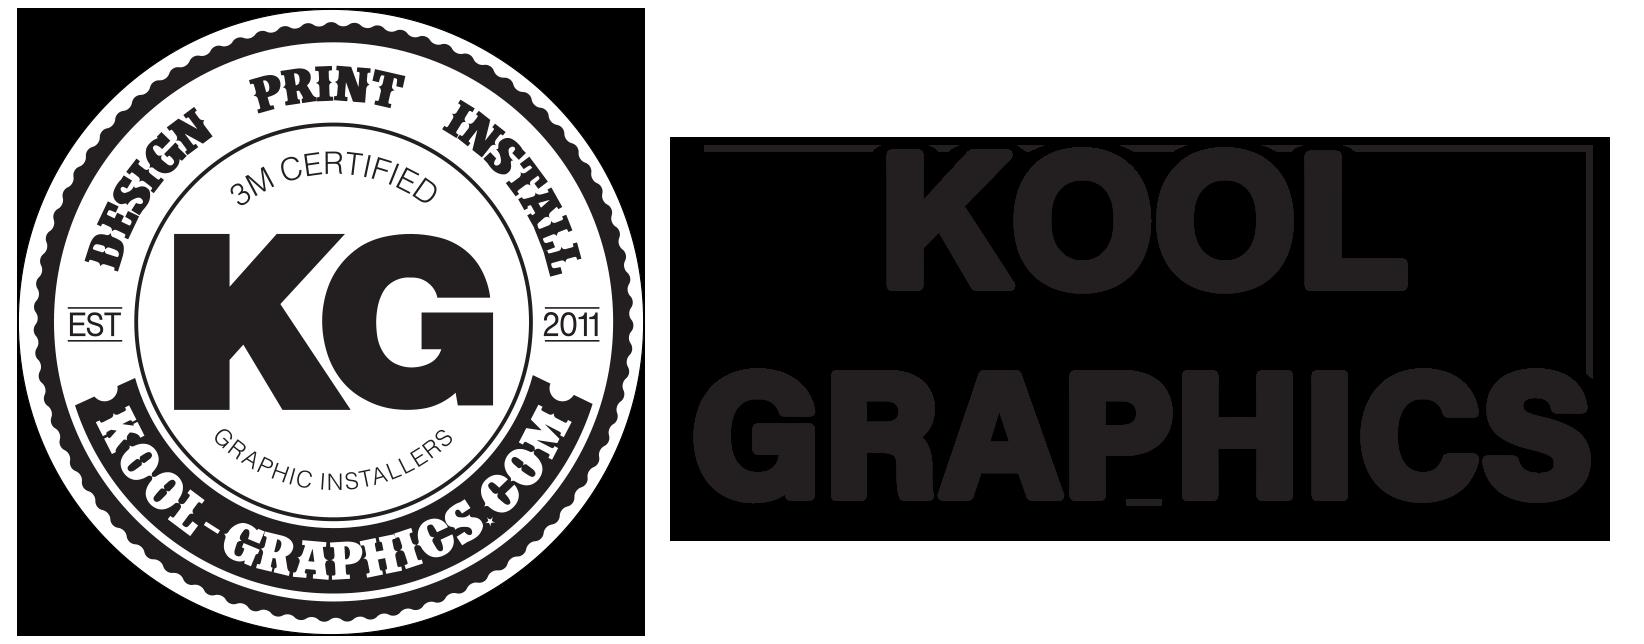 Kool Graphics